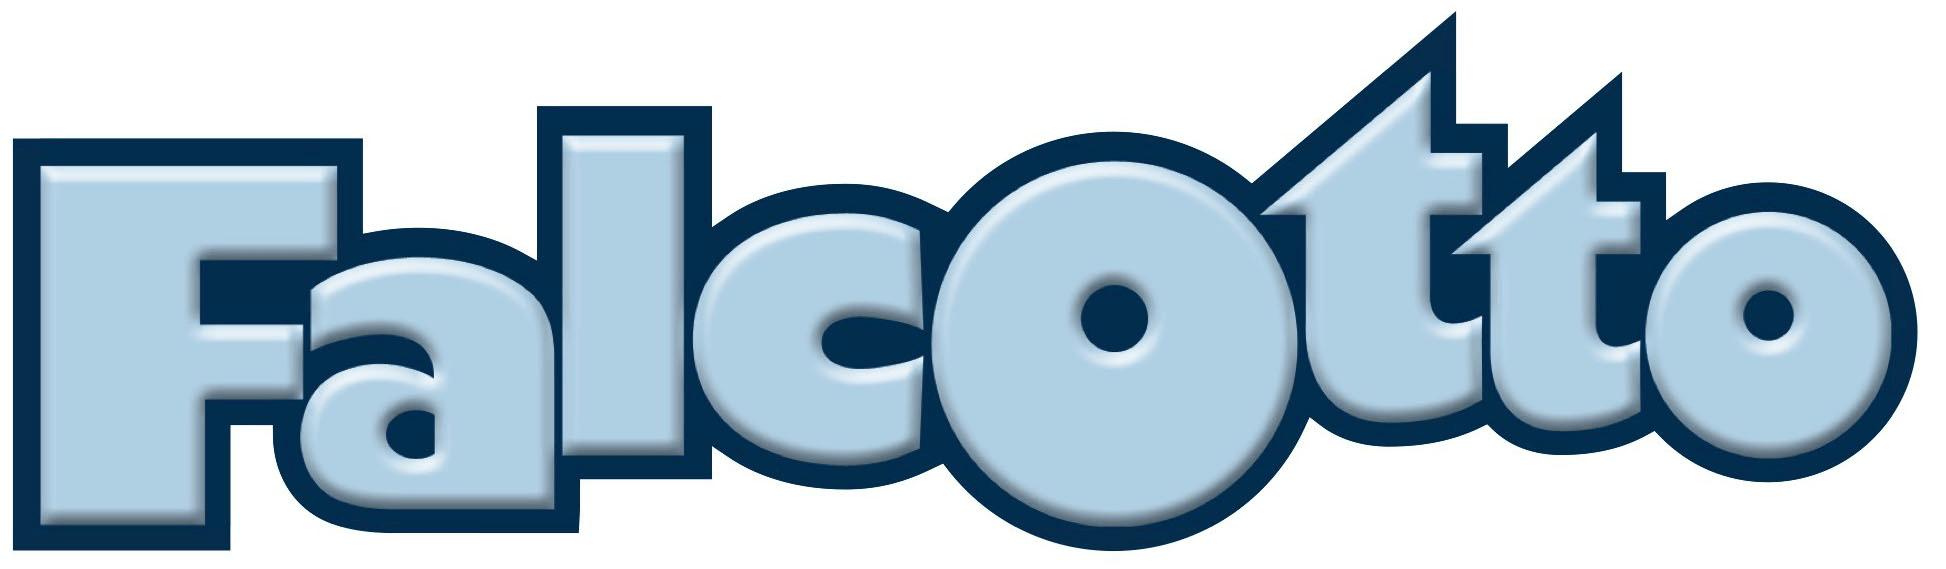 falcotto.html